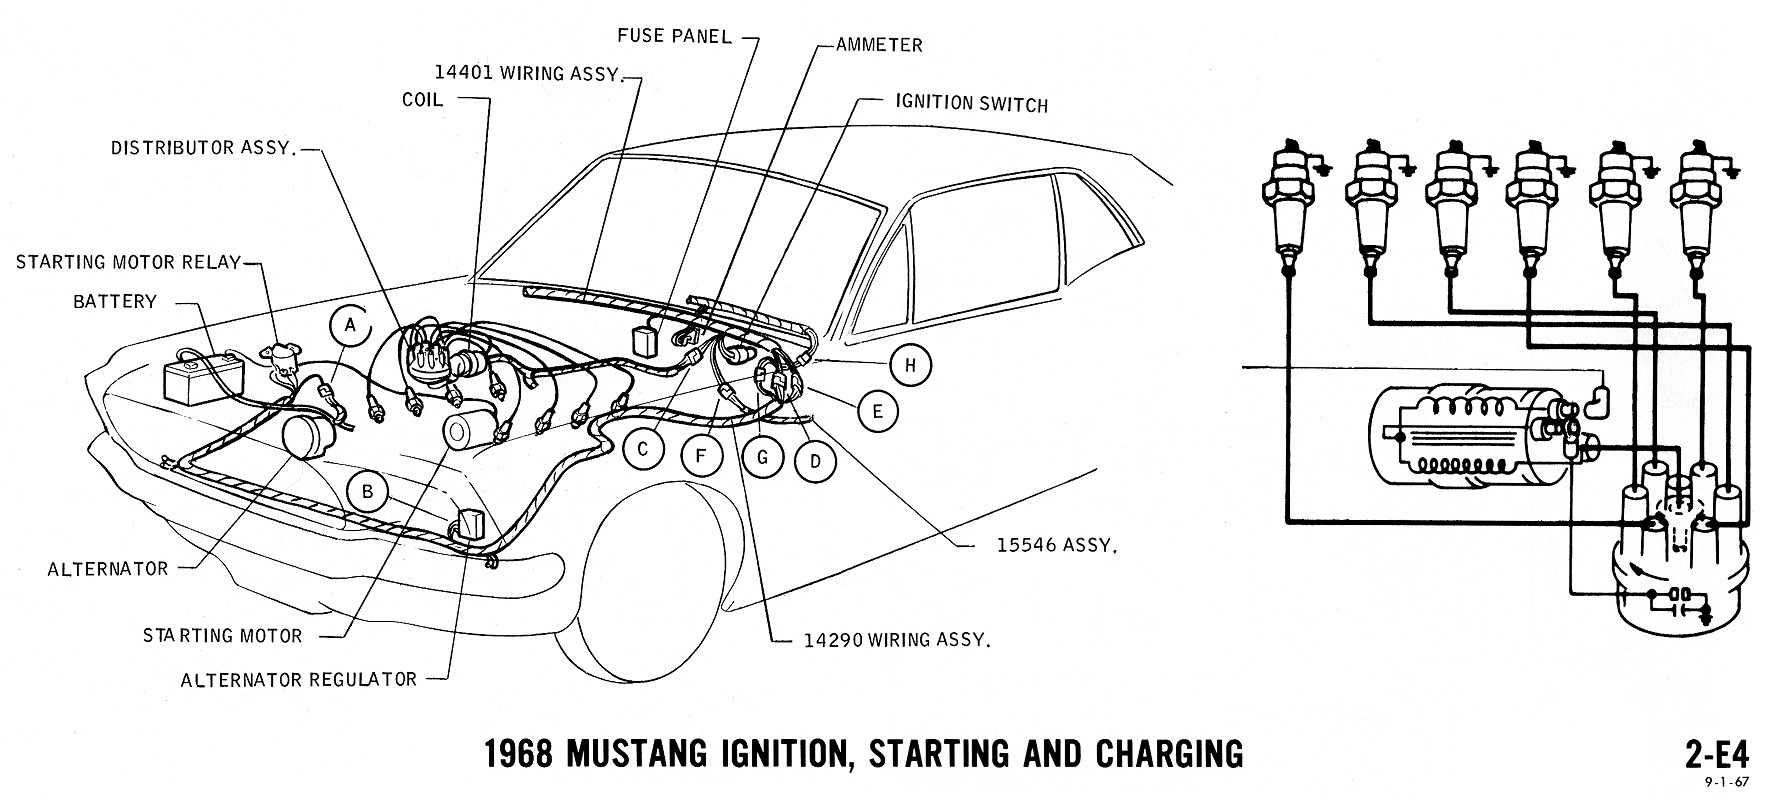 EW_6453] 66 Mustang Convertible Wiring Harness Download DiagramRopye Unho Rect Mohammedshrine Librar Wiring 101